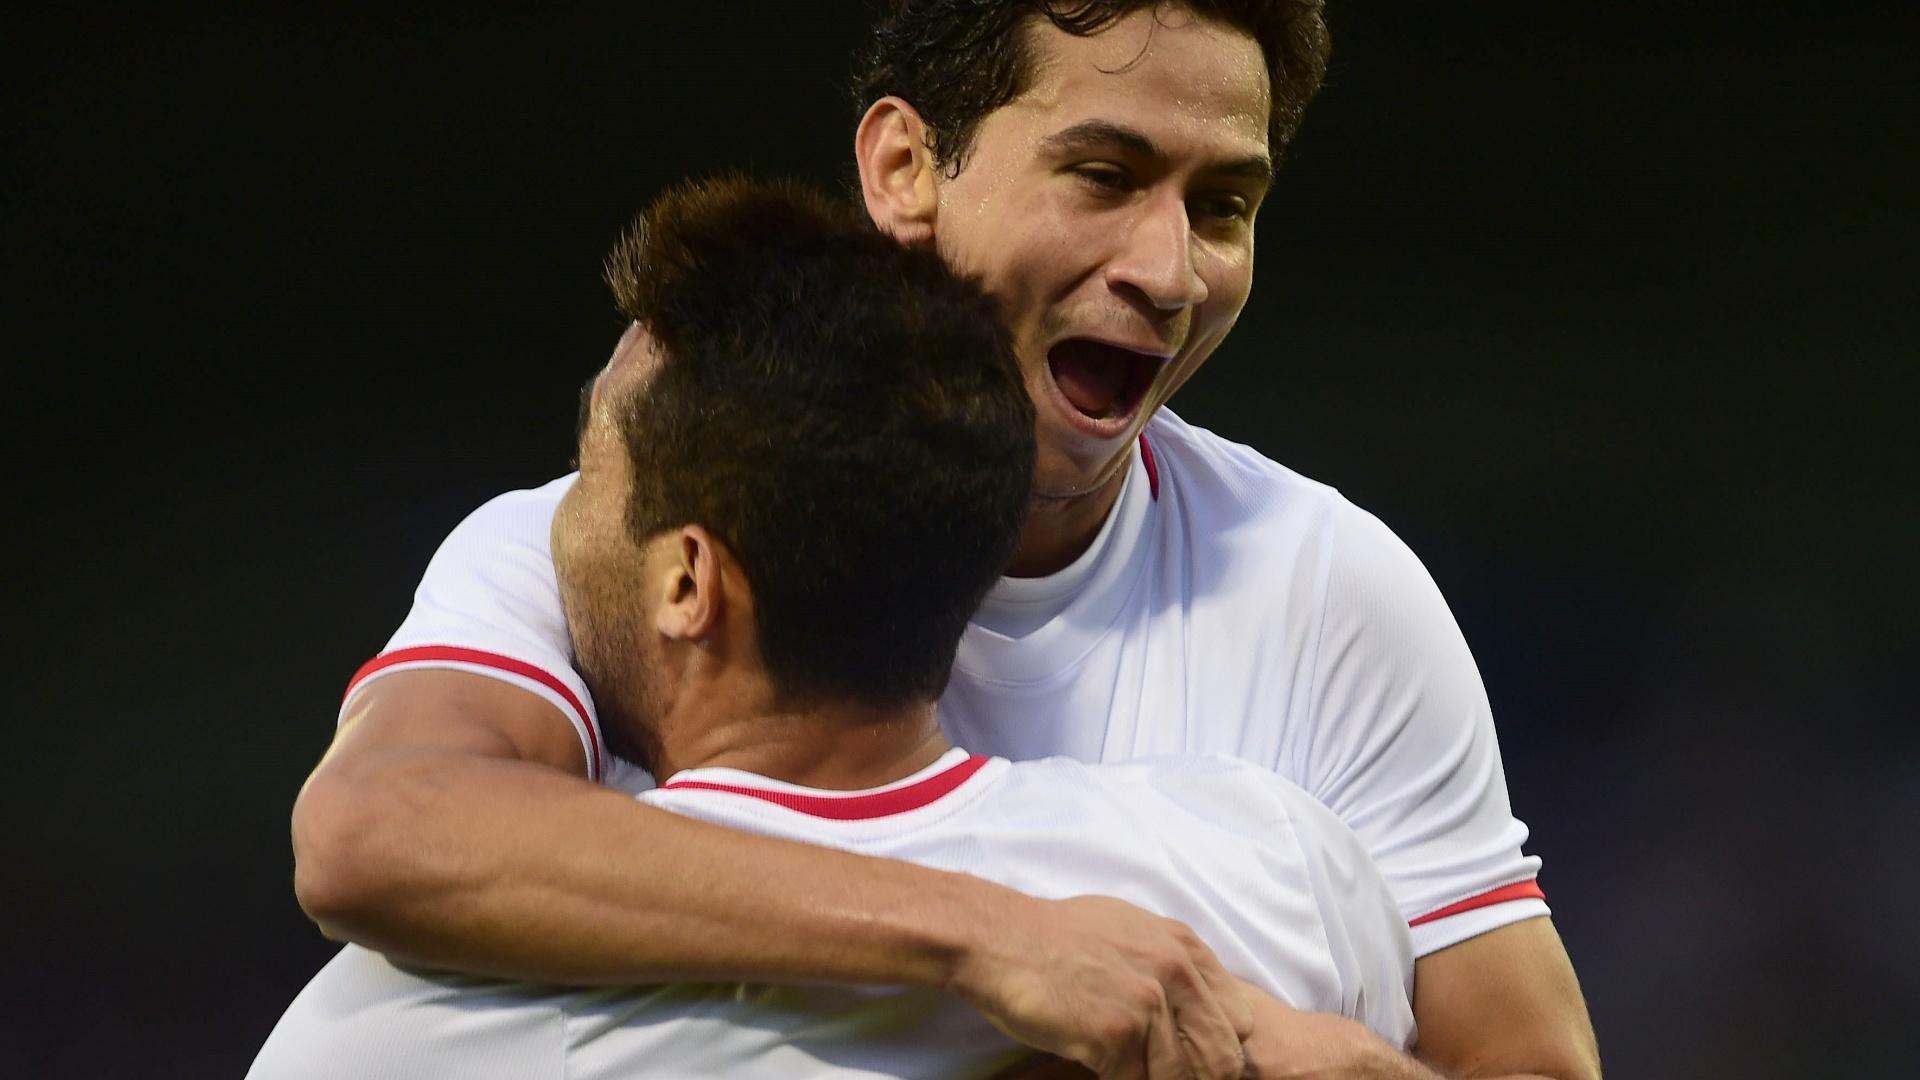 Ganso é abraçado por Alan Kardec depois de marcar gol